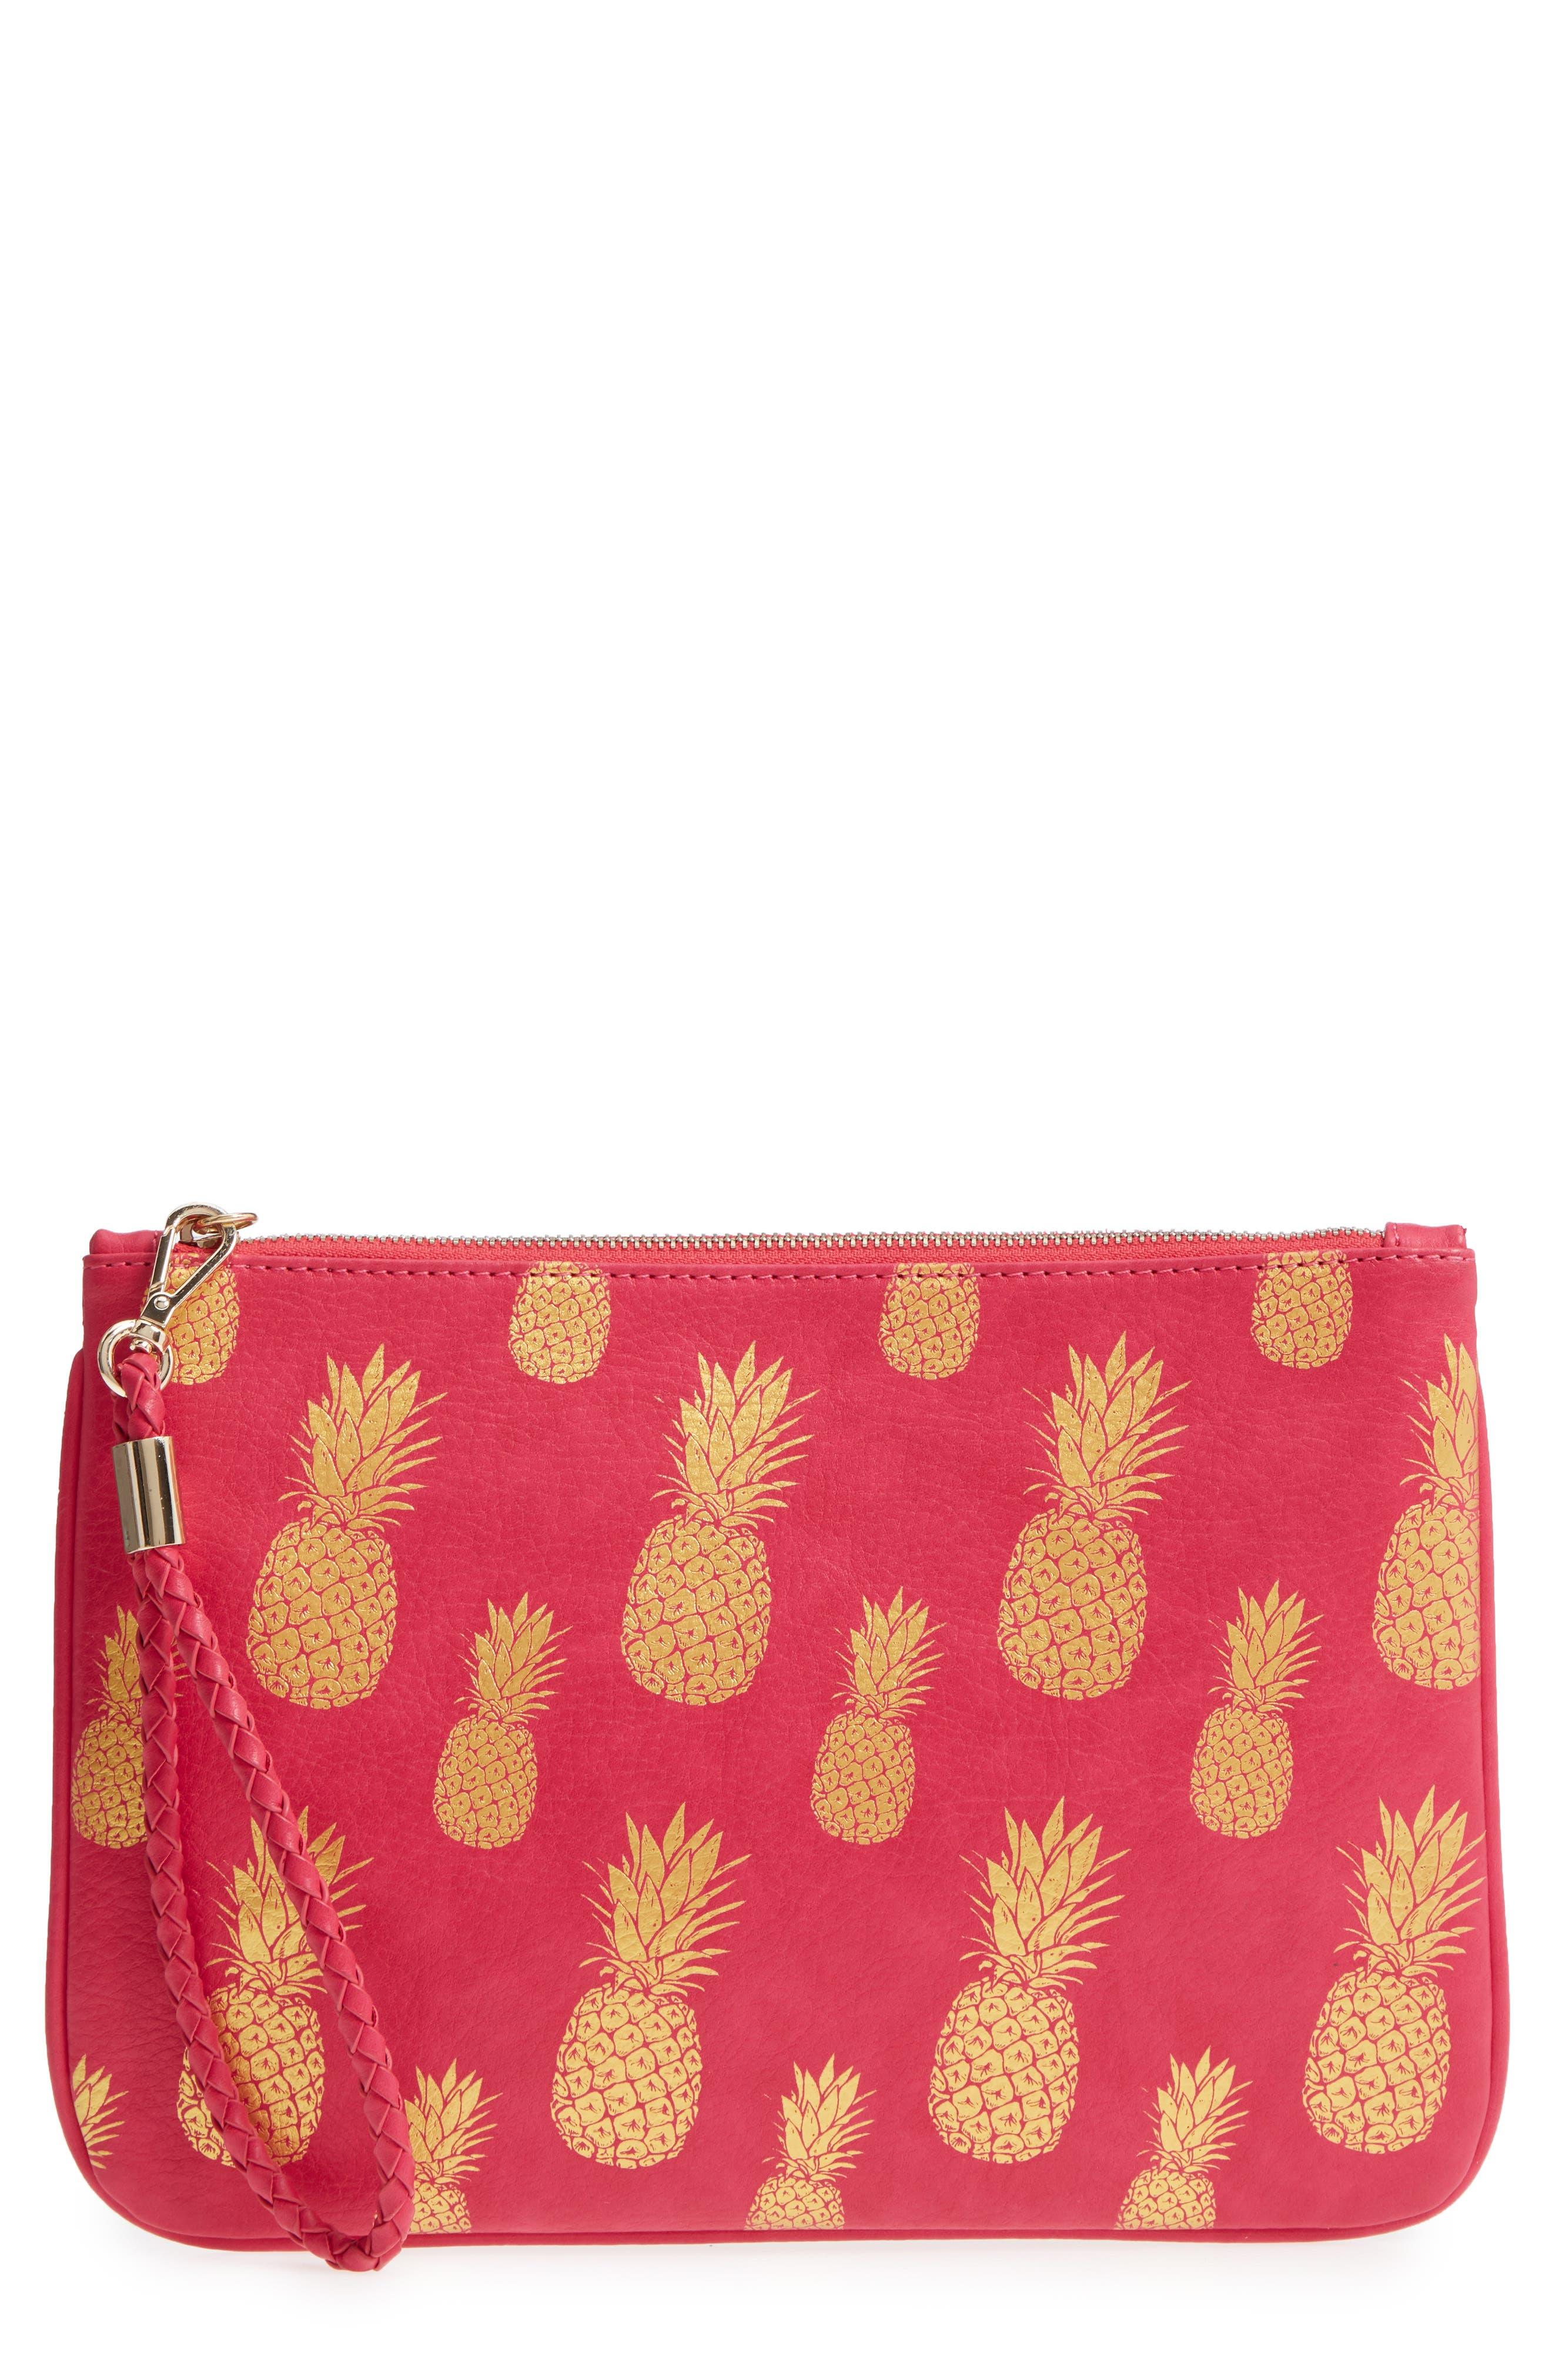 Mali + Lili Alice Pineapple Print Vegan Leather Clutch,                             Main thumbnail 1, color,                             HOT PINK